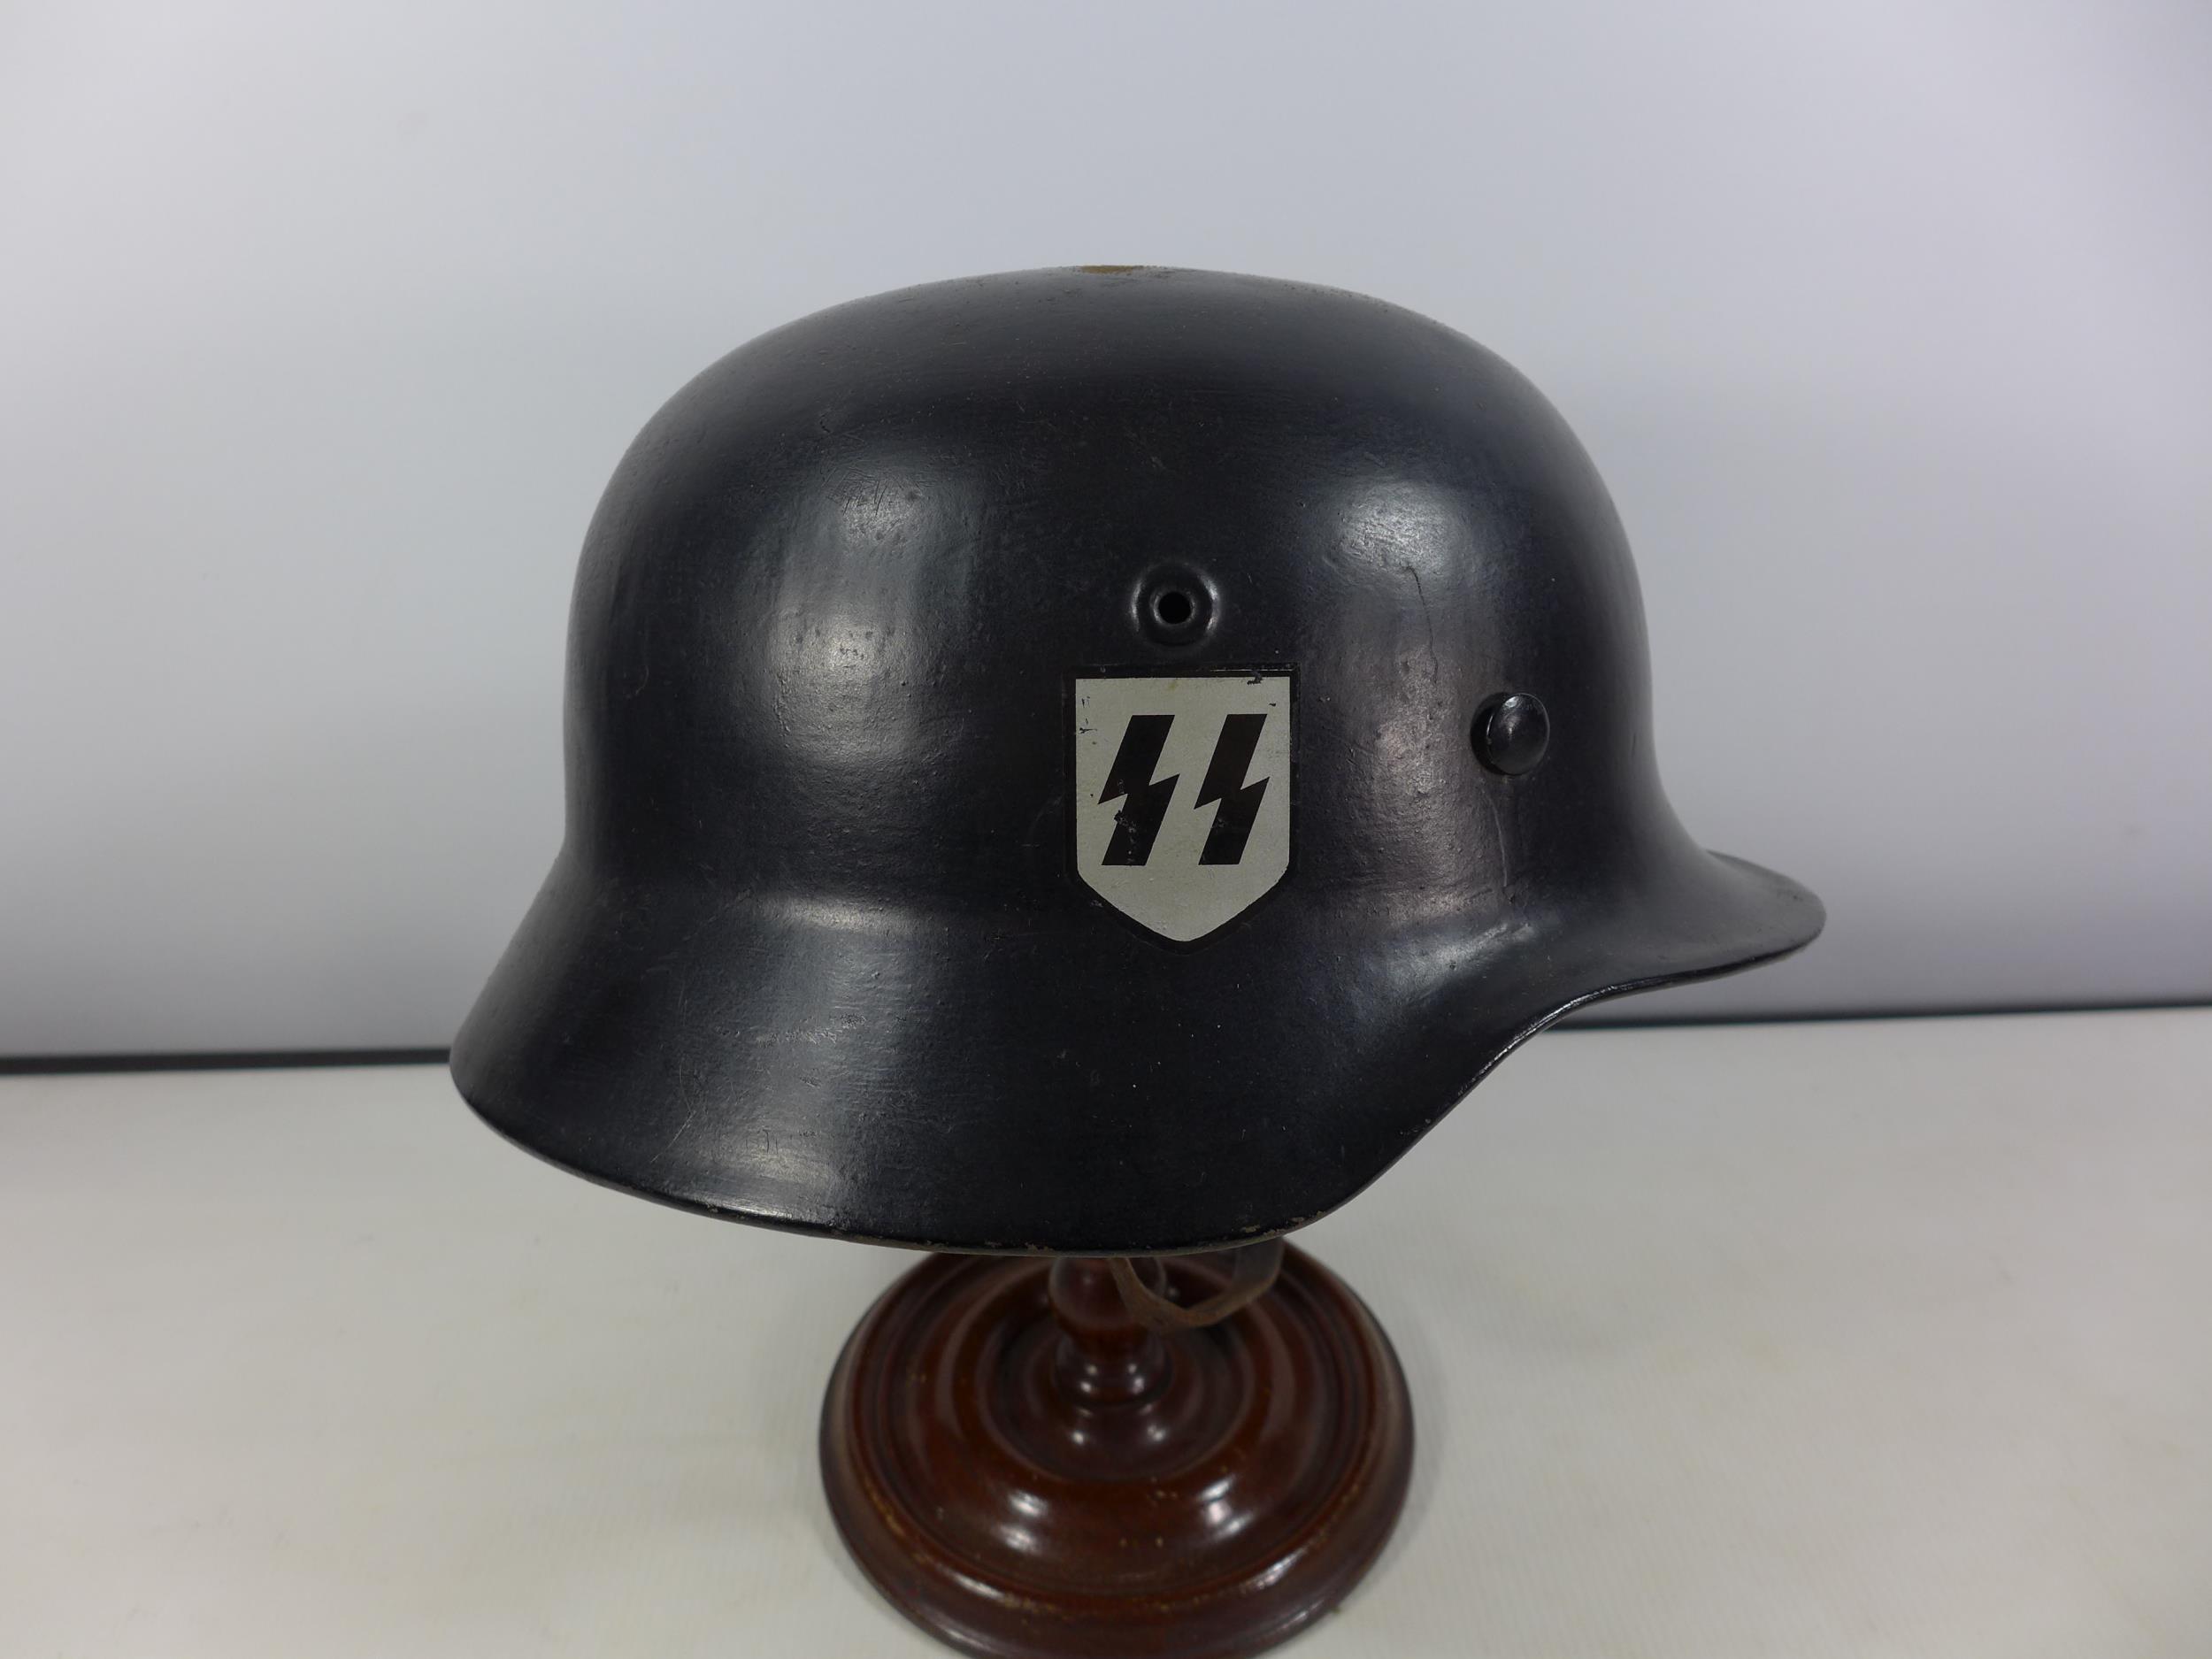 A GERMAN BLACK PAINTED METAL HELMET WITH SS RUNES AND SWASTIKA DECALS